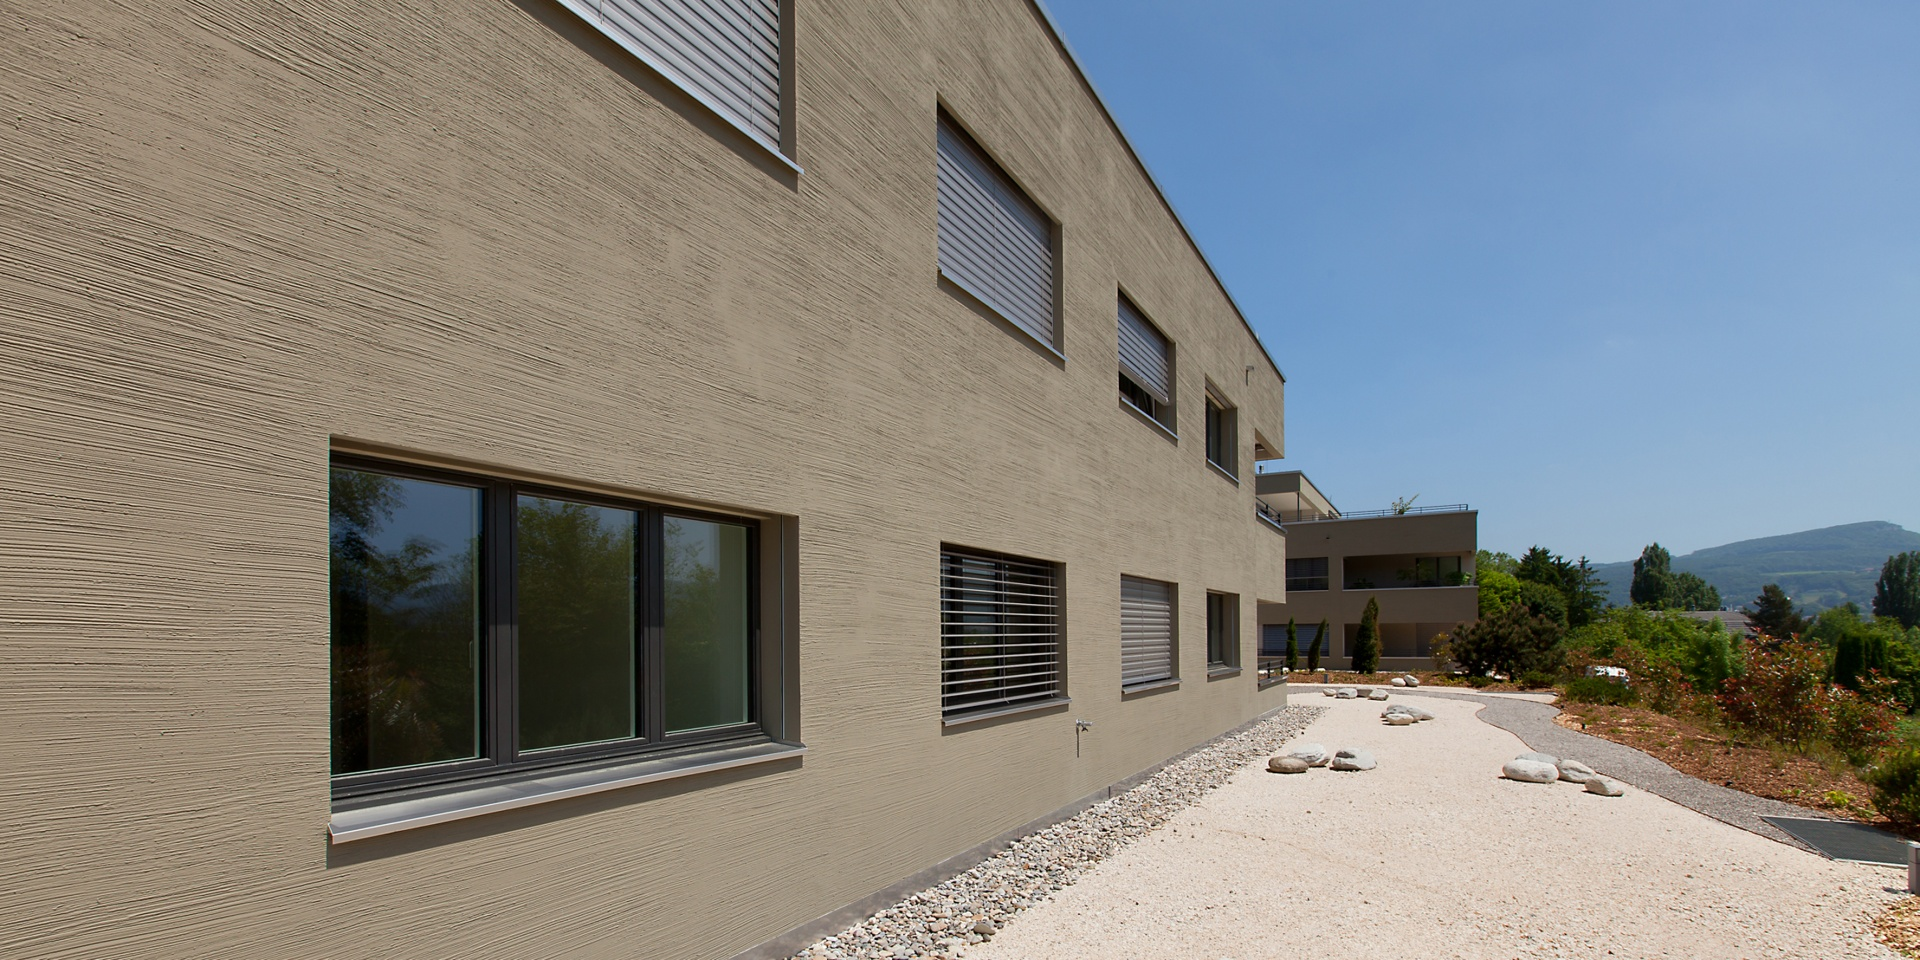 © Architektur Rolf Stalder AG - Christian Roth